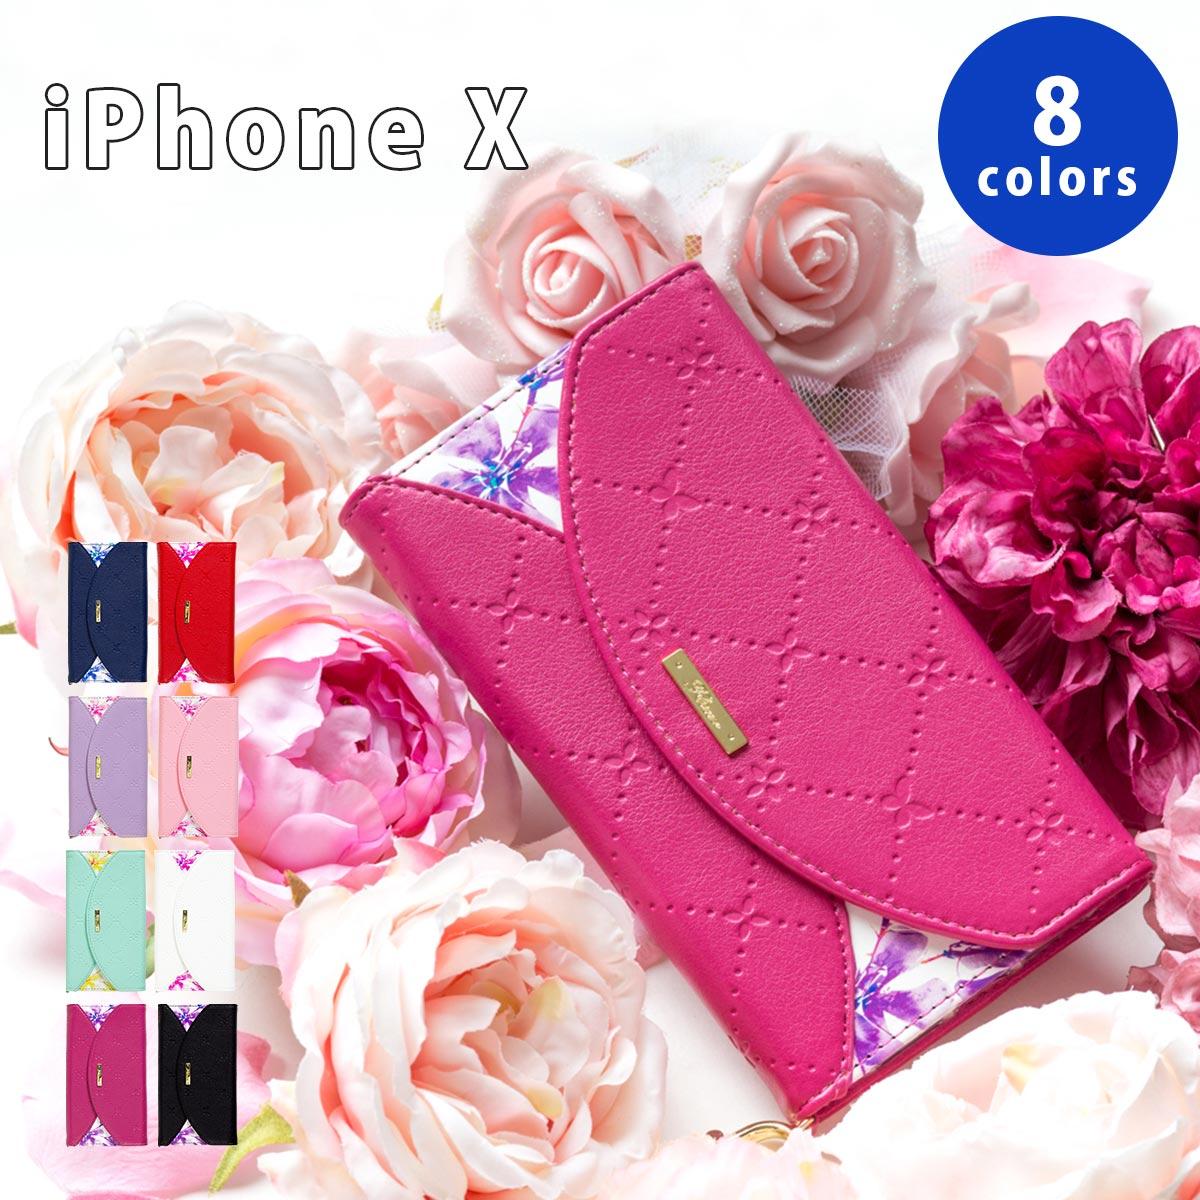 iPhone X ケース 手帳型 スマホケース スマートフォン おしゃれ アイフォン 大人女子 NATURAL design ナチュラルデザイン FLEUR LETTER